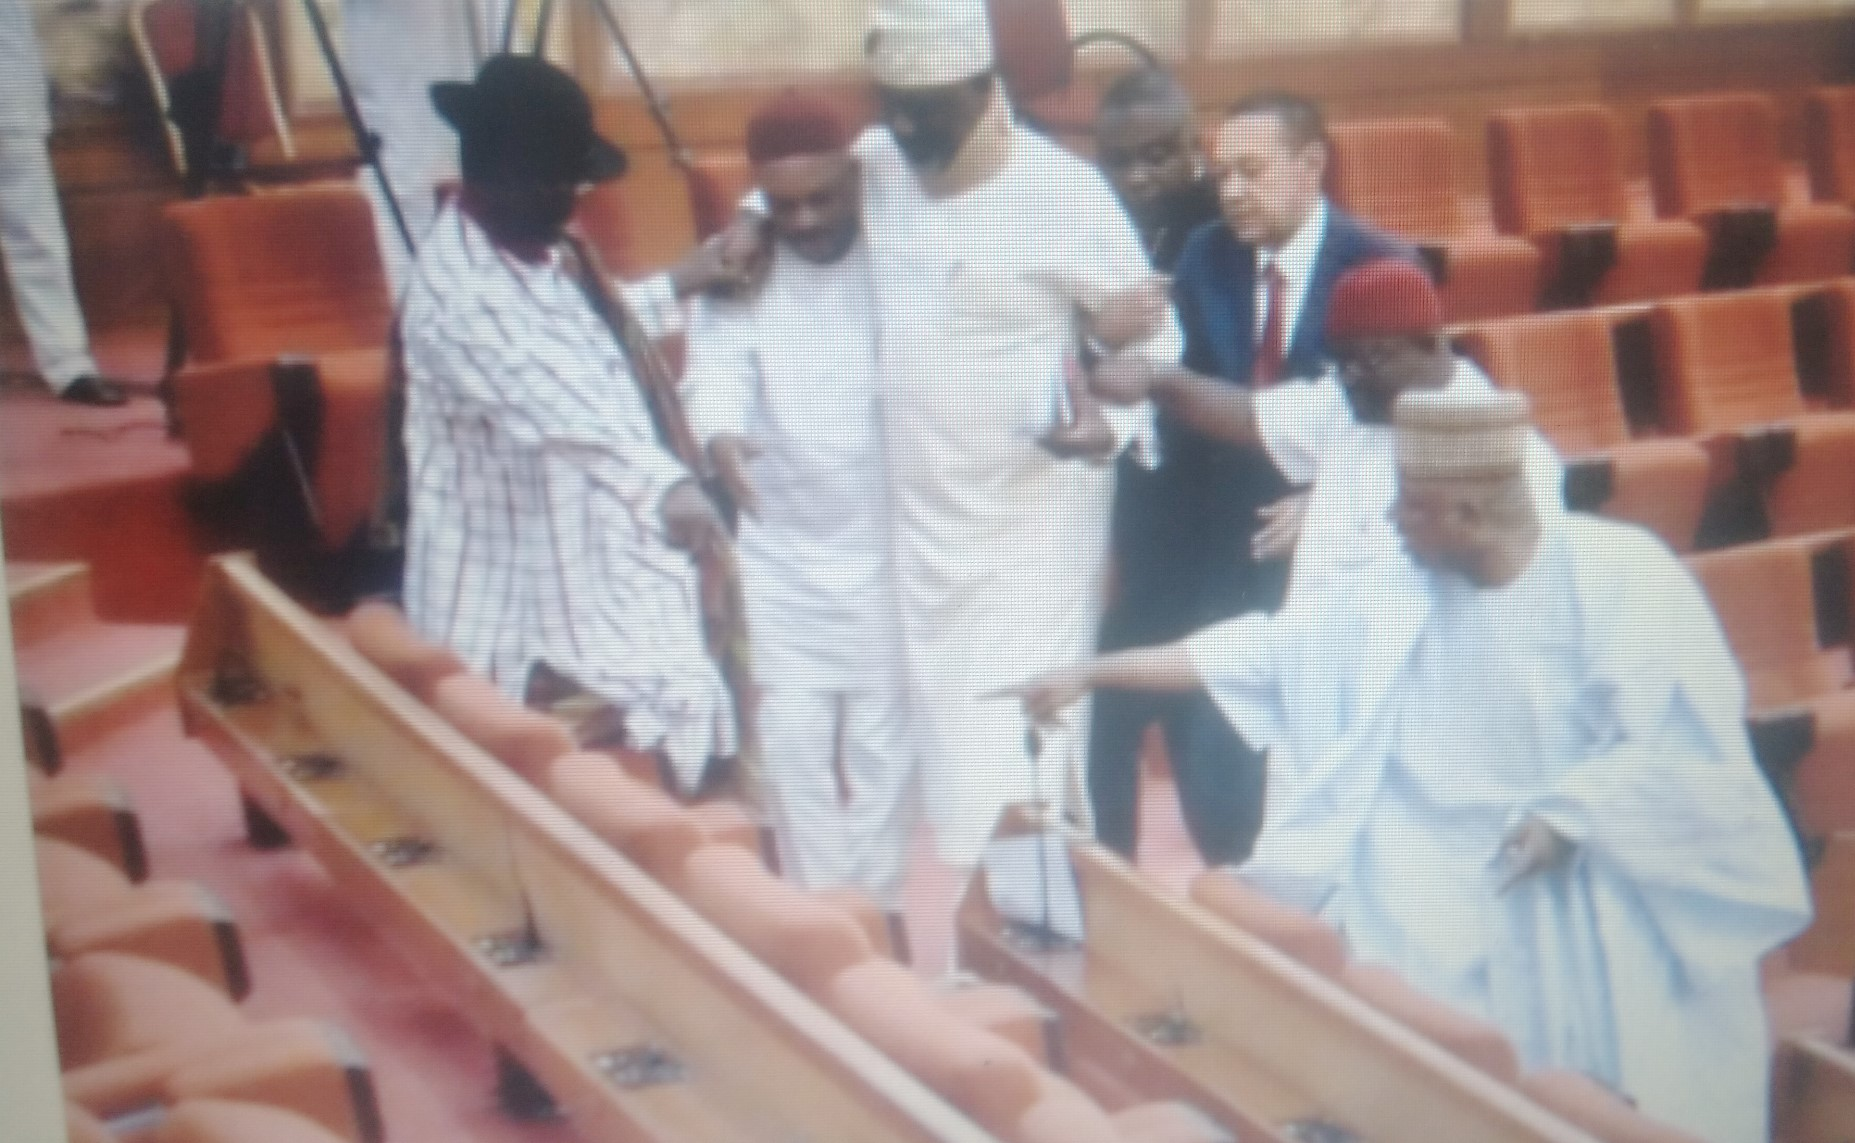 Outspoken senator Melaye resumes, continues hitting at President Buhari